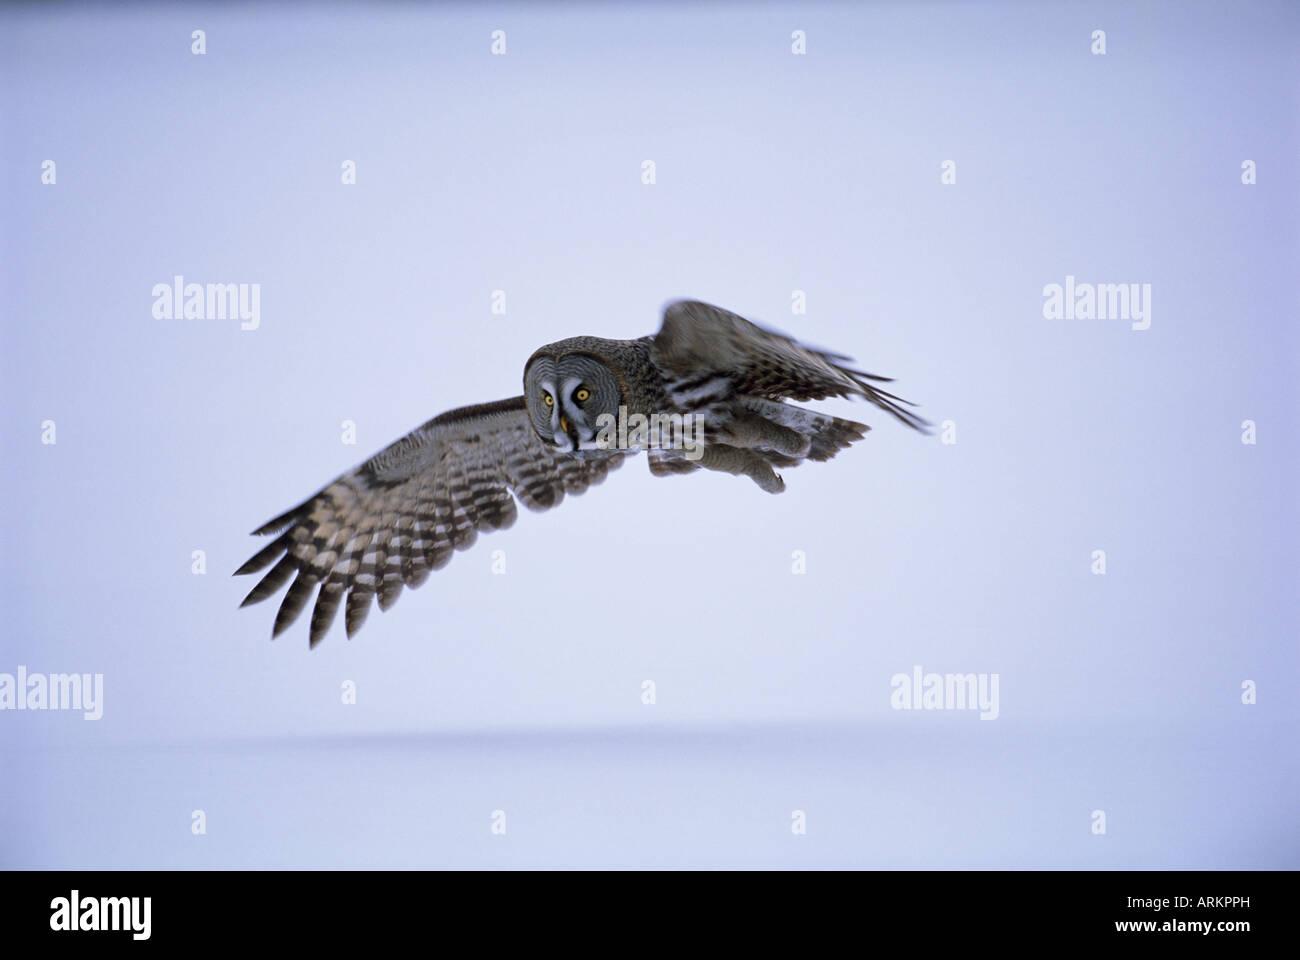 Great grey owl (Strix nebulosa) in flight, Finland, Scandinavia, Europe - Stock Image